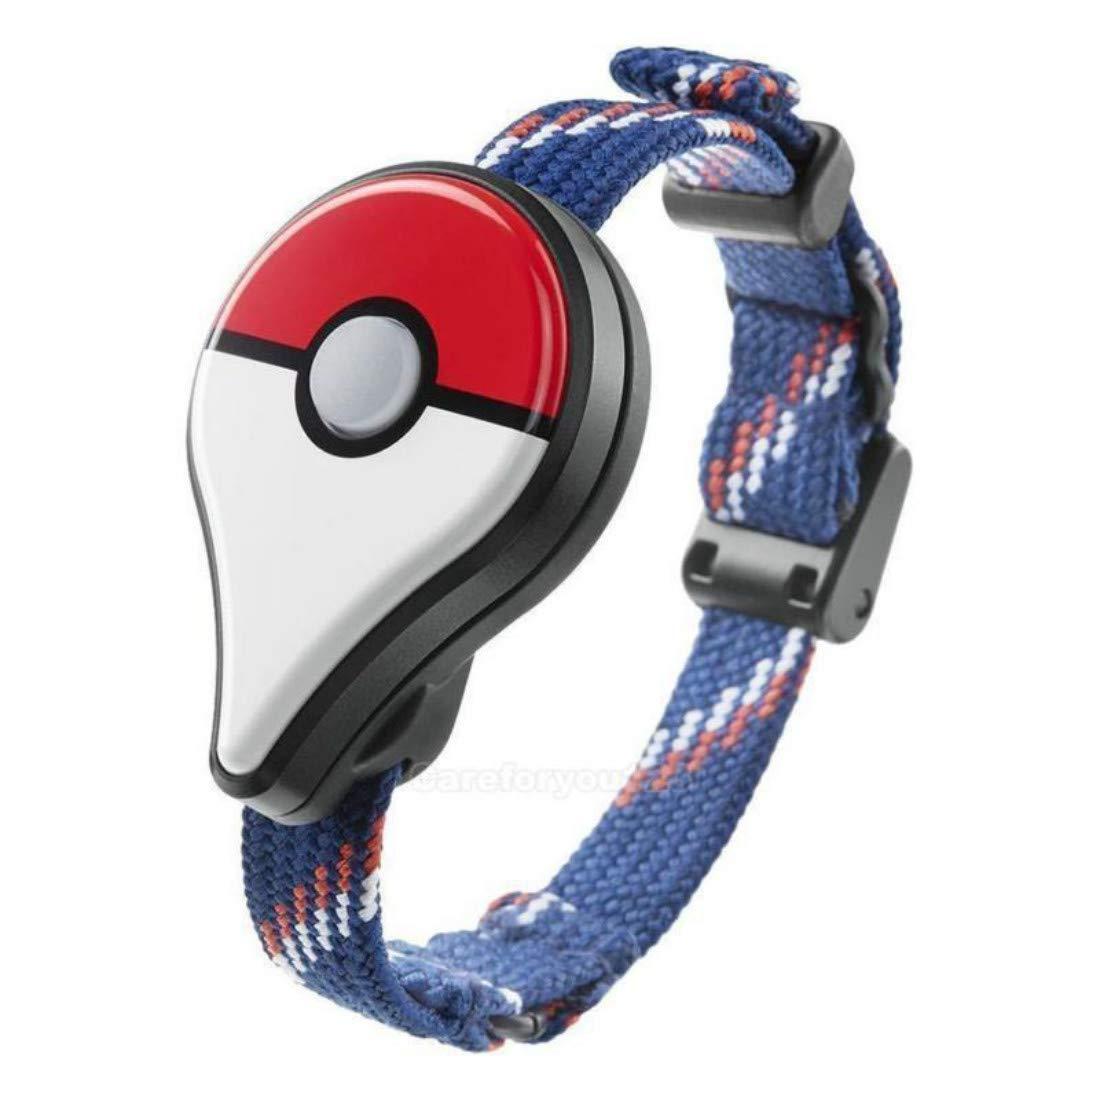 Bluetooth Wristband Watch Game Accessory for Nintendo Pokemon Go Plus